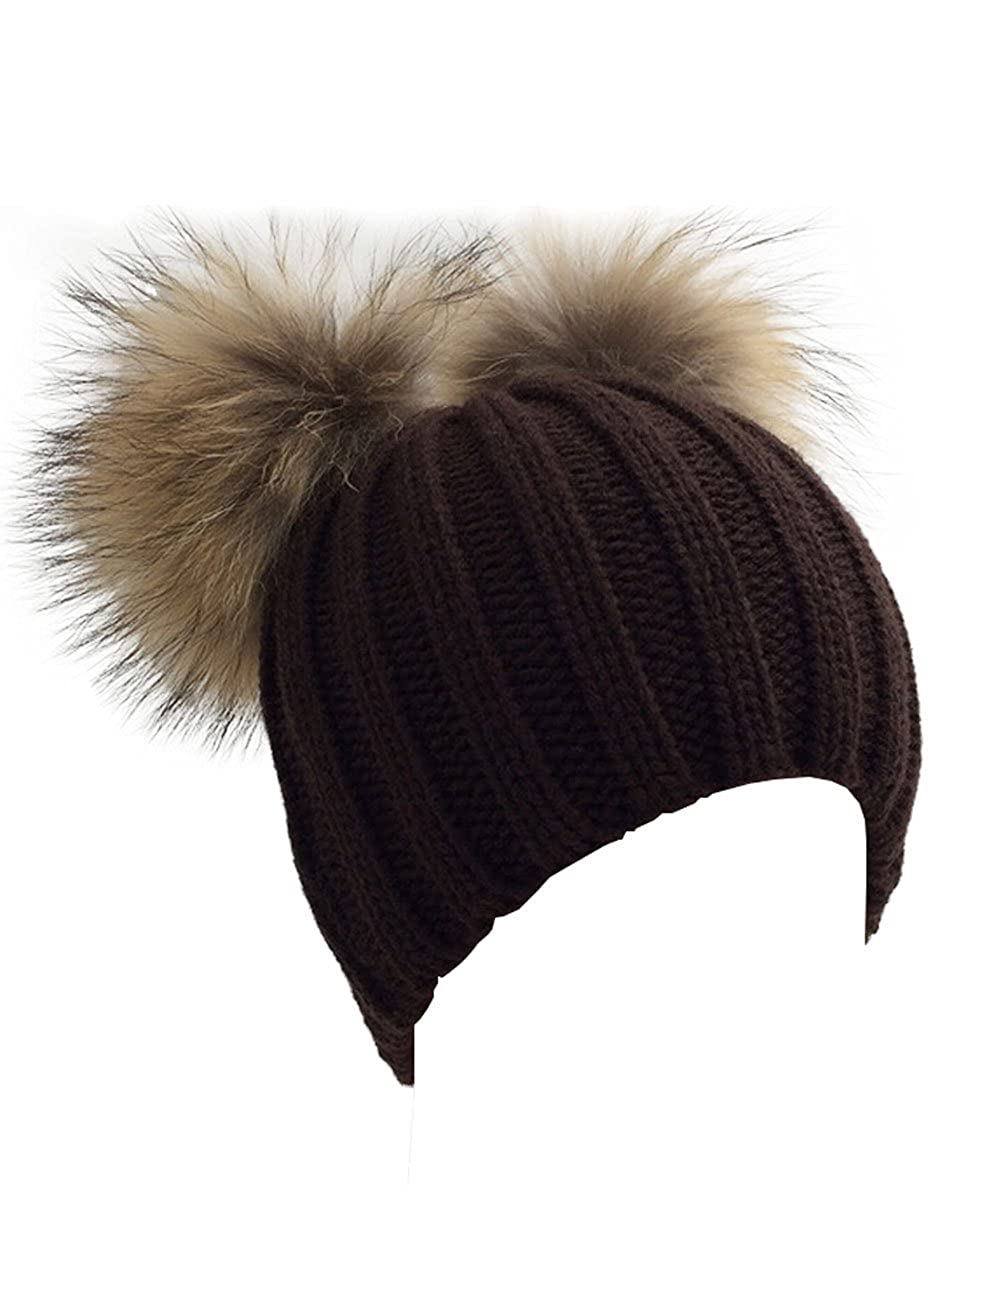 XWDA Women's Crystal Knitted Raccoon Fur Double Pom Beanie Hat Ski Cap Free Size)